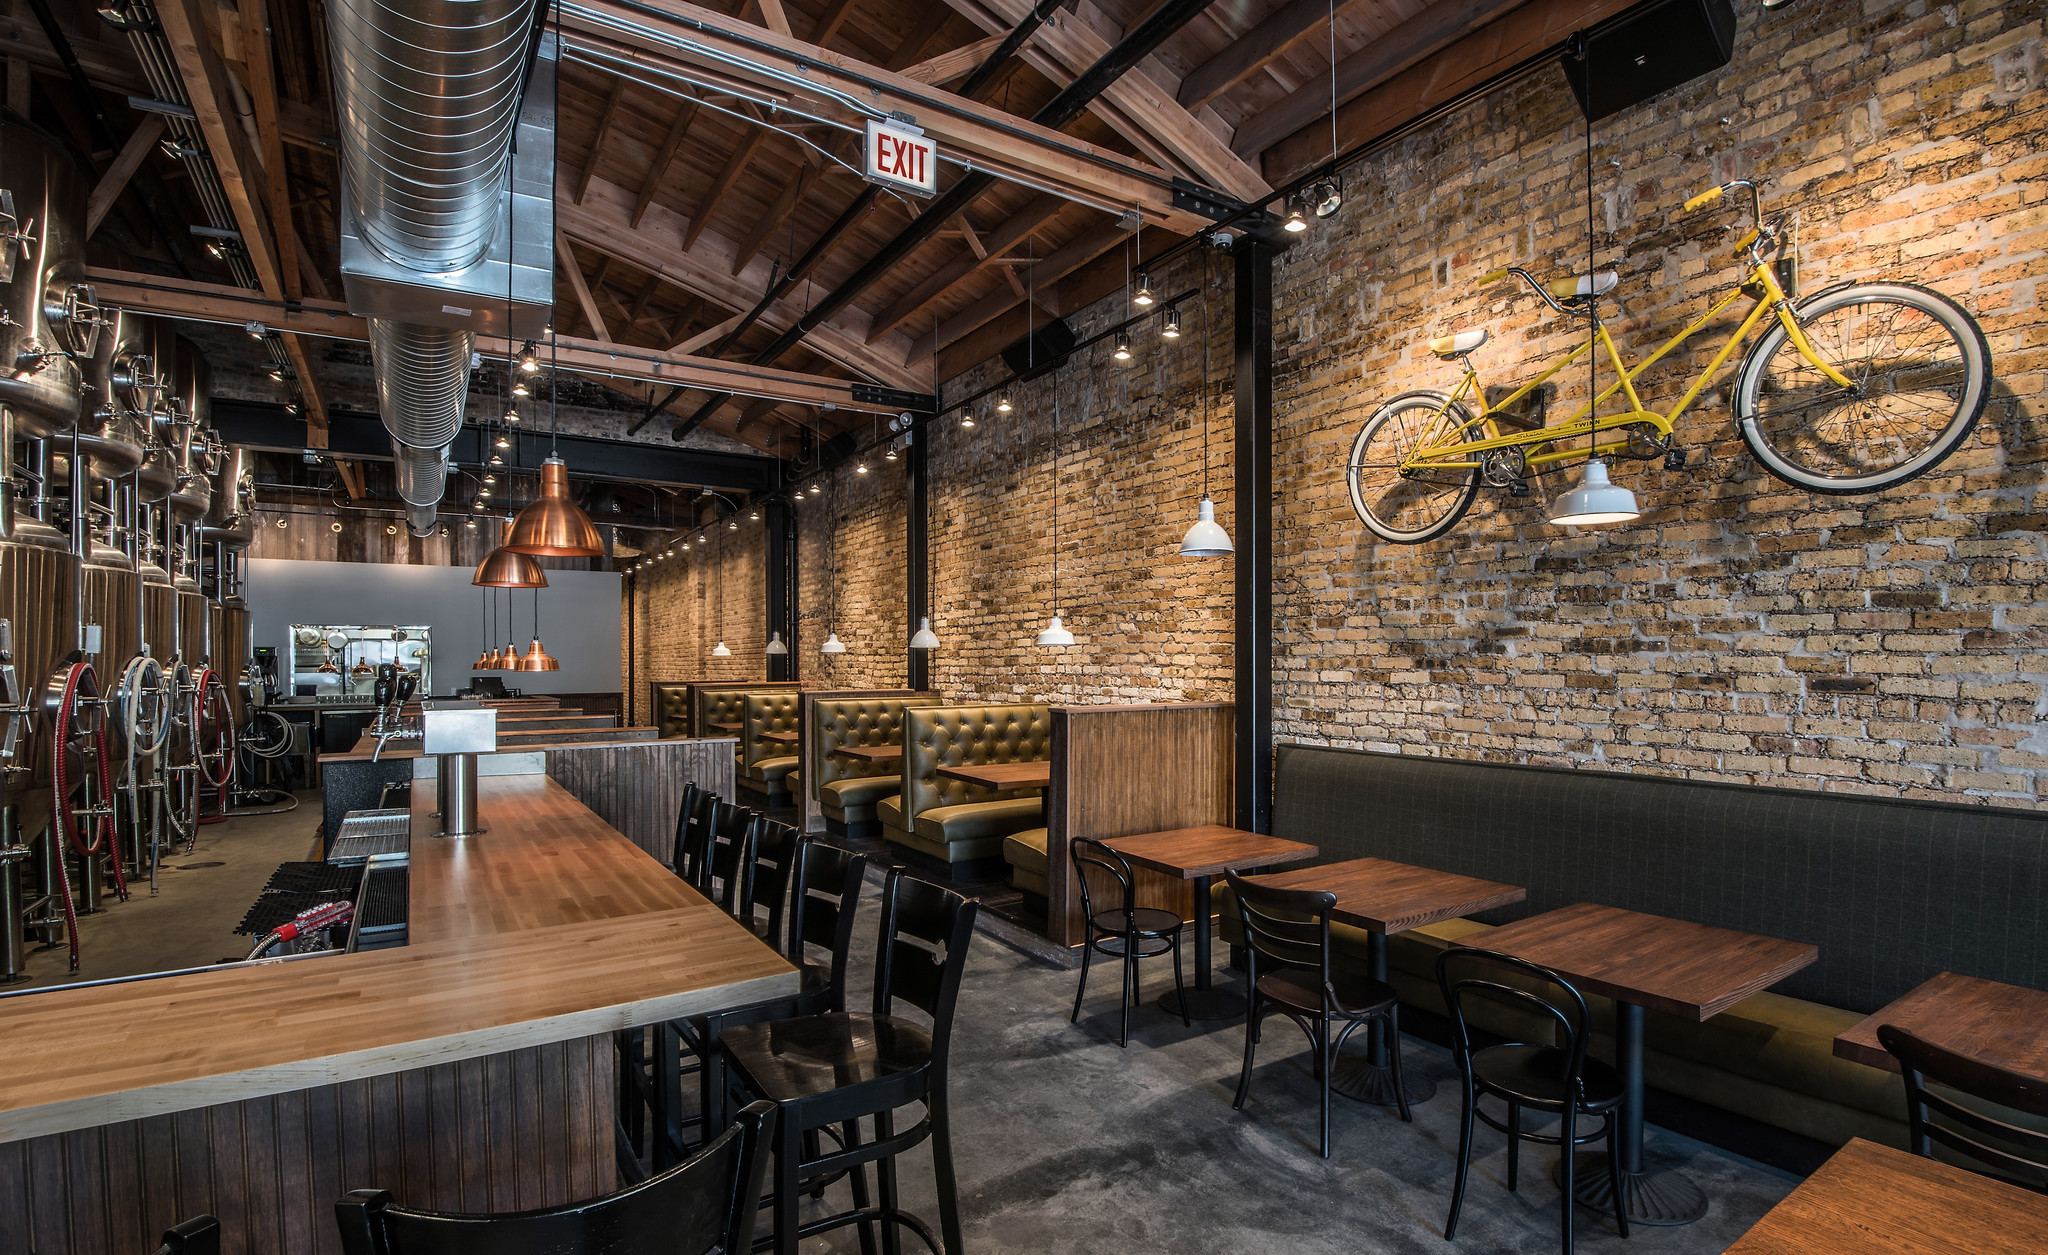 Corridor Brewery Opening On Oct 15 Chicago Tribune